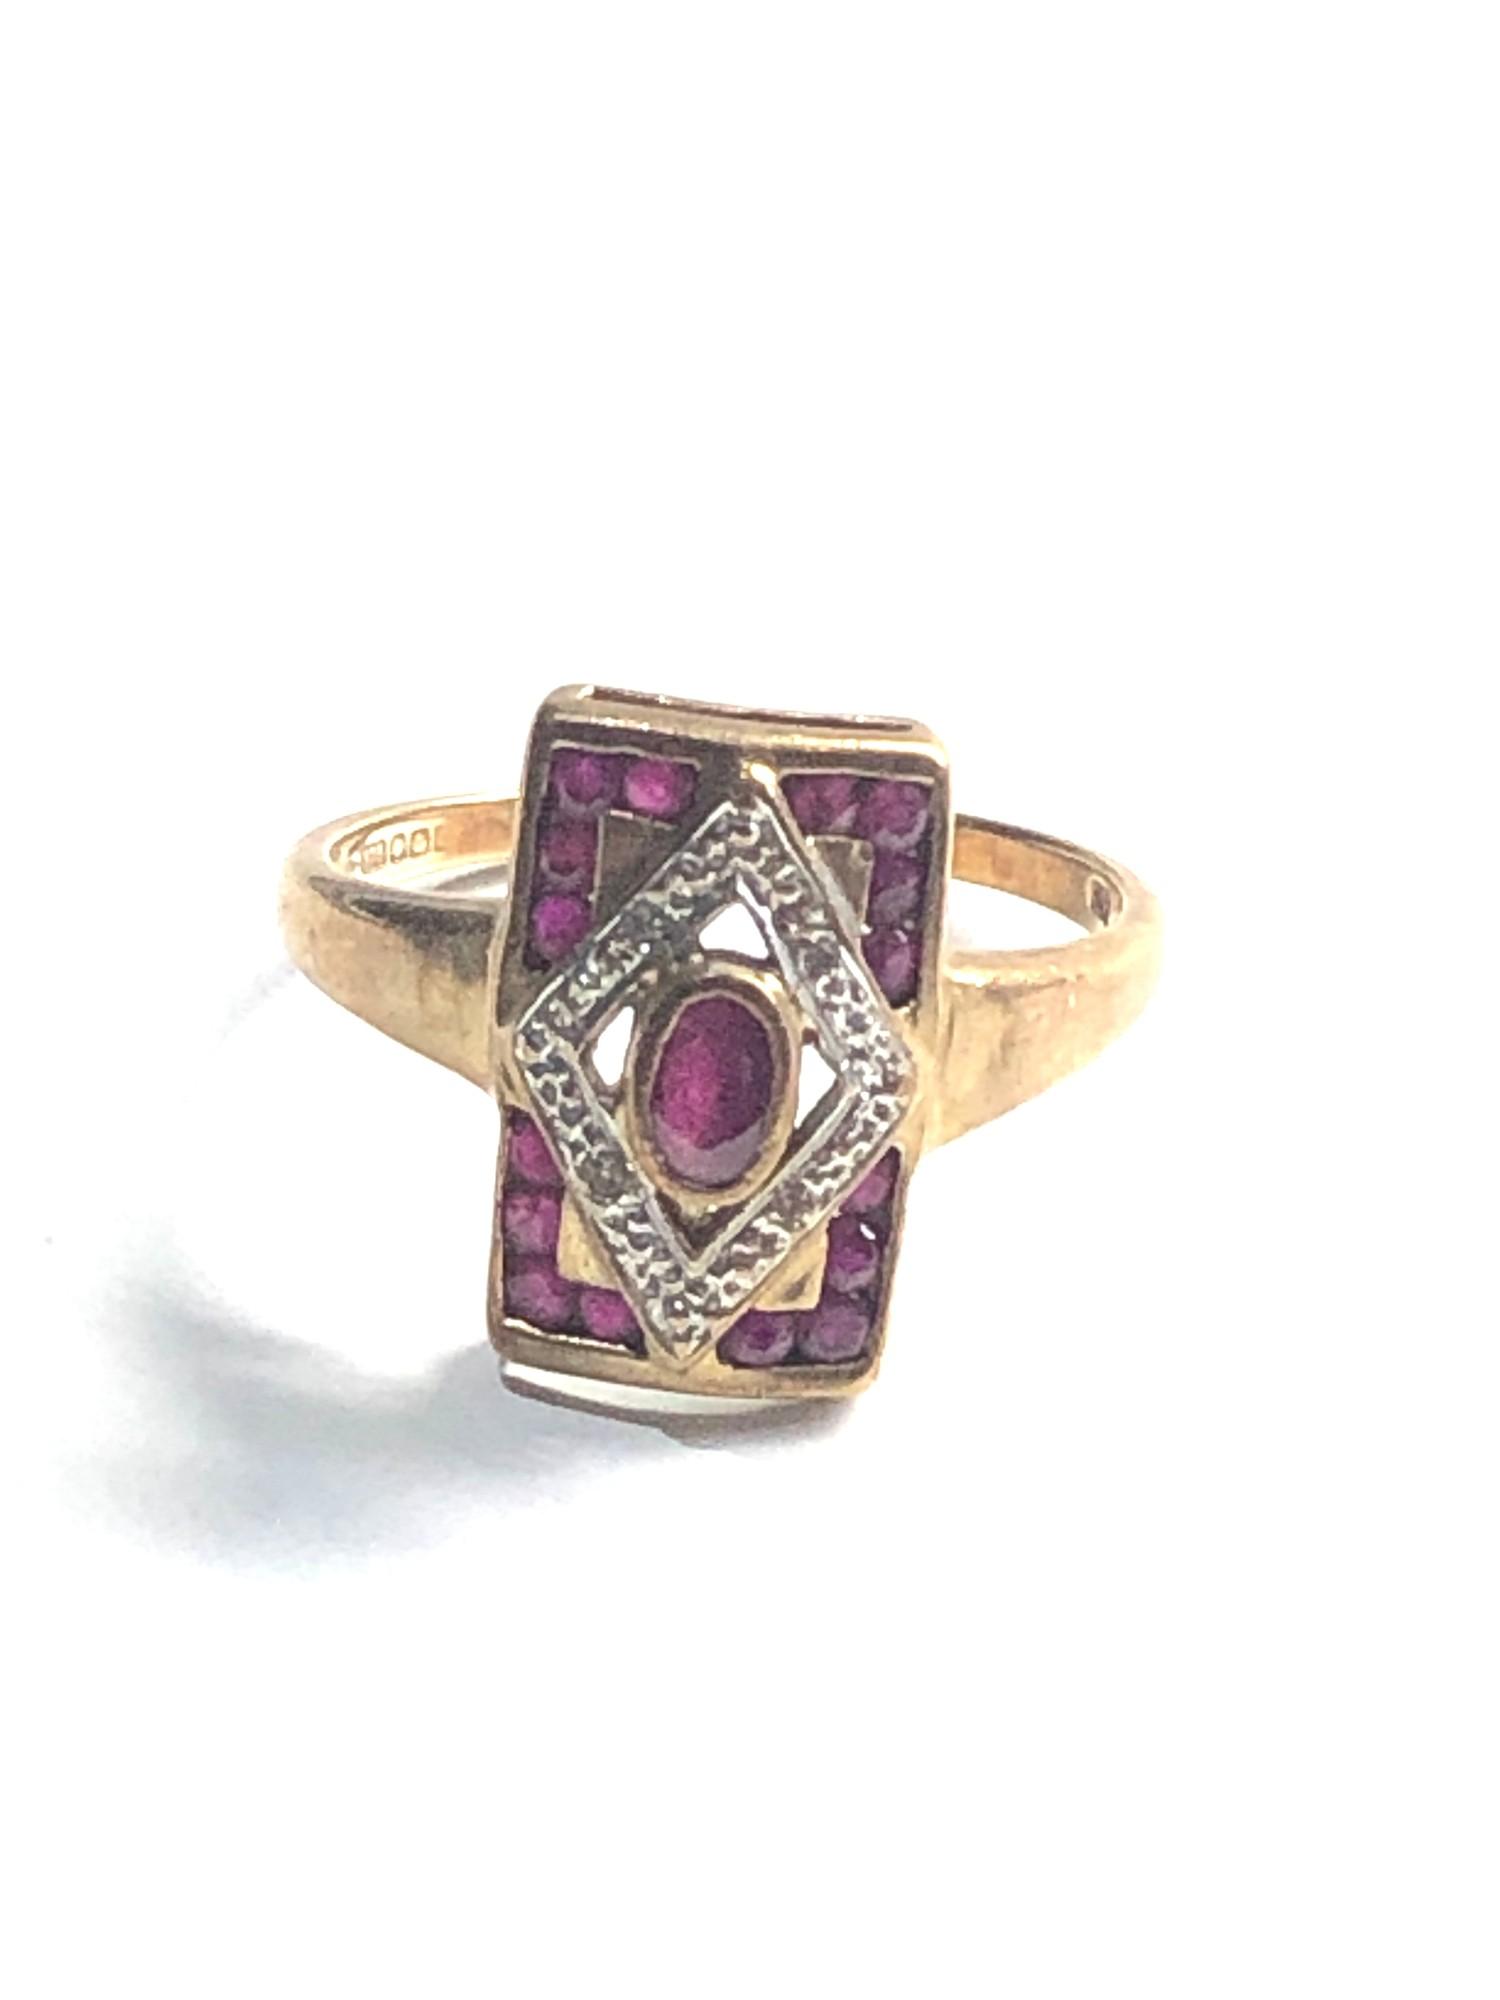 Vintage 9ct Gold ruby ring w/ diamond detail 4g